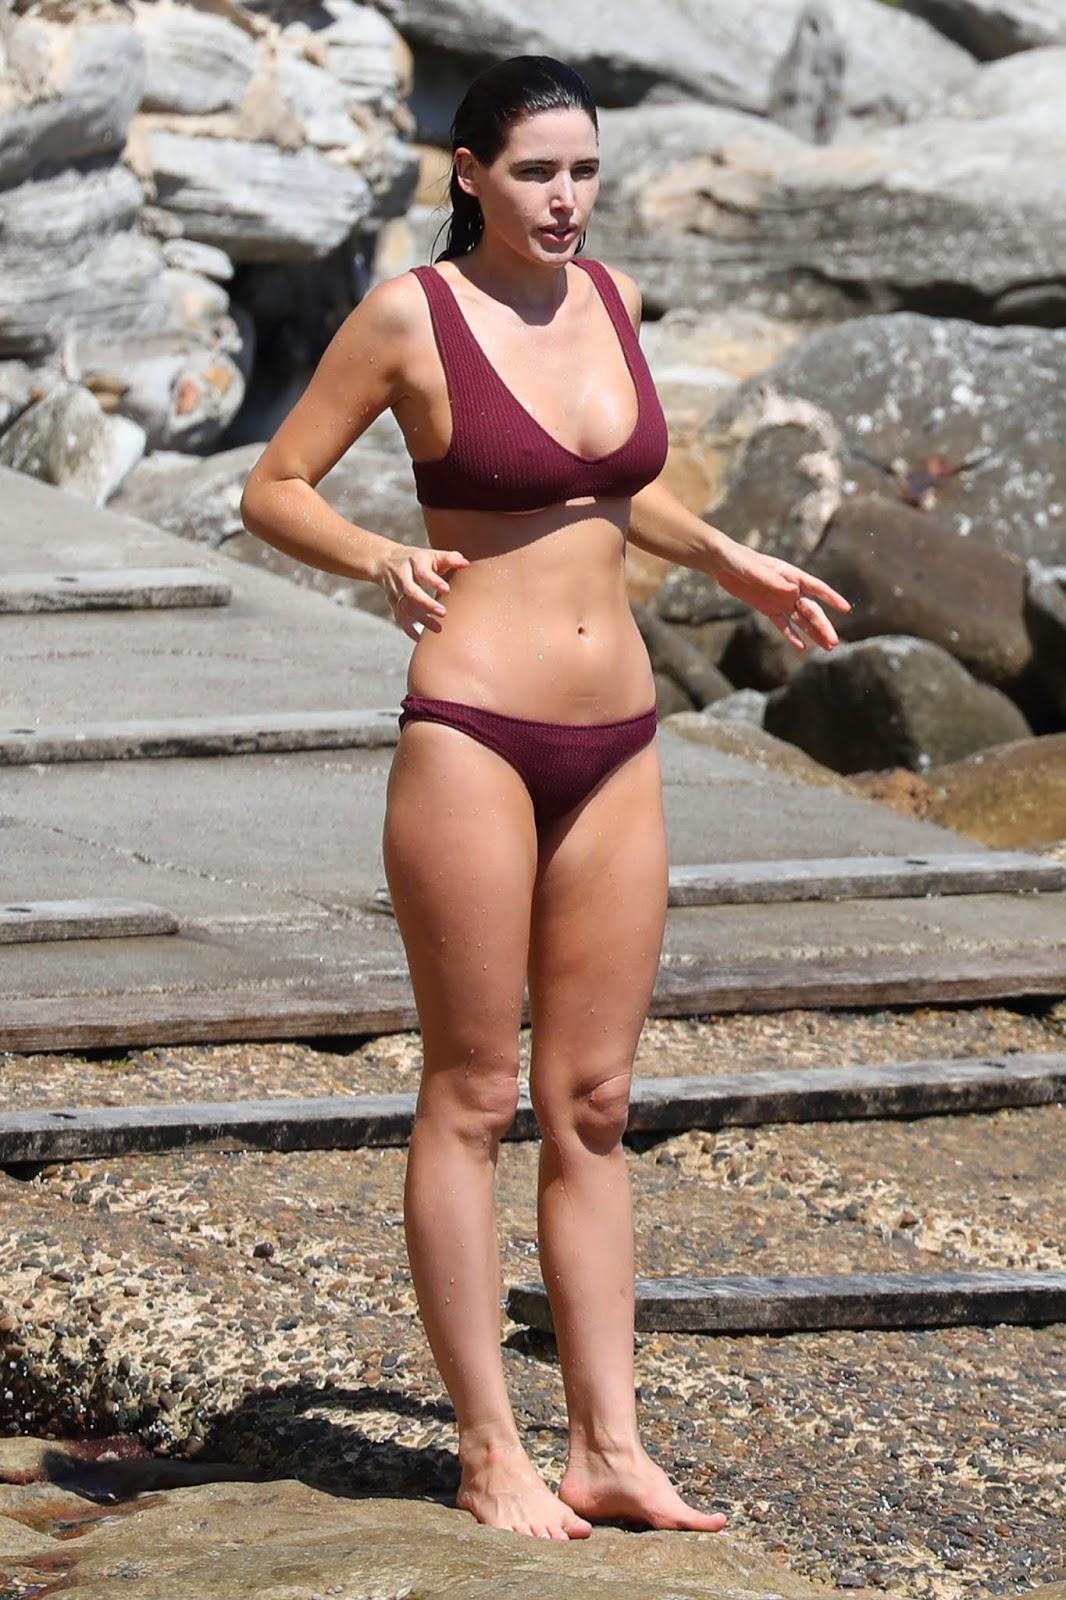 Tahnee Atkinson pictured going for a swim in Bondi - 03/04/2019